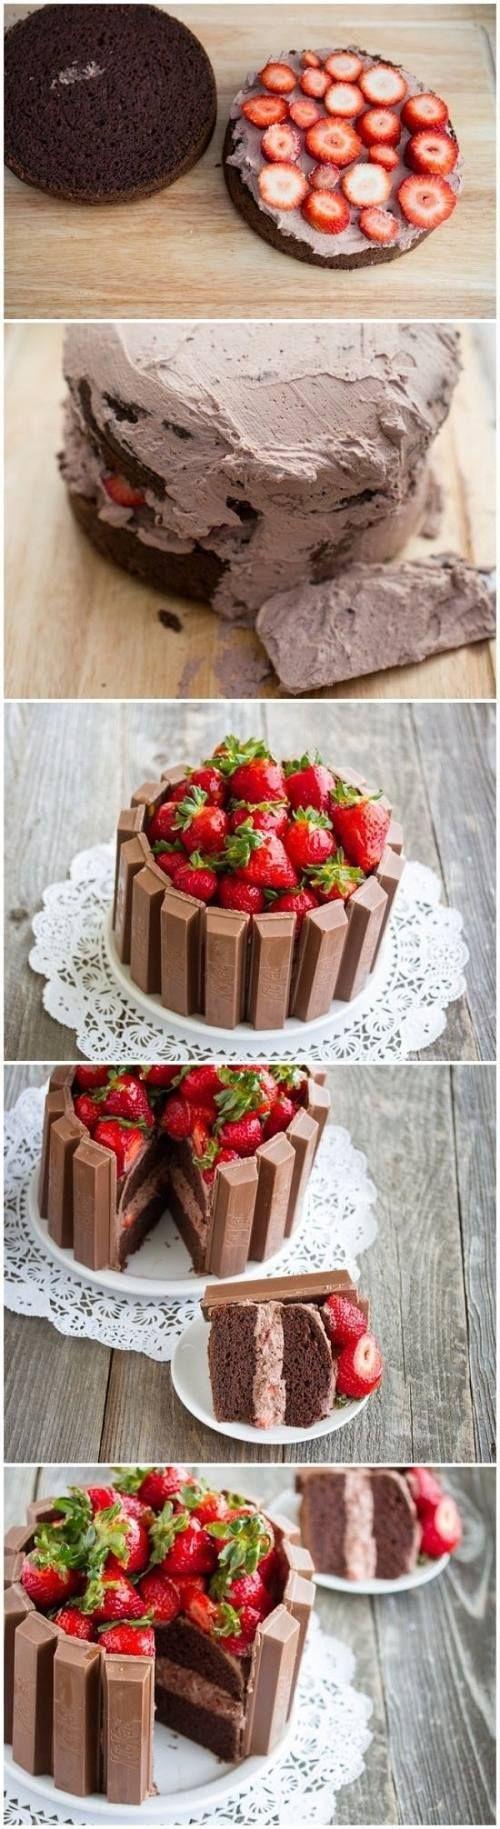 @Eladia51 tenemos que hacer este pastel :)